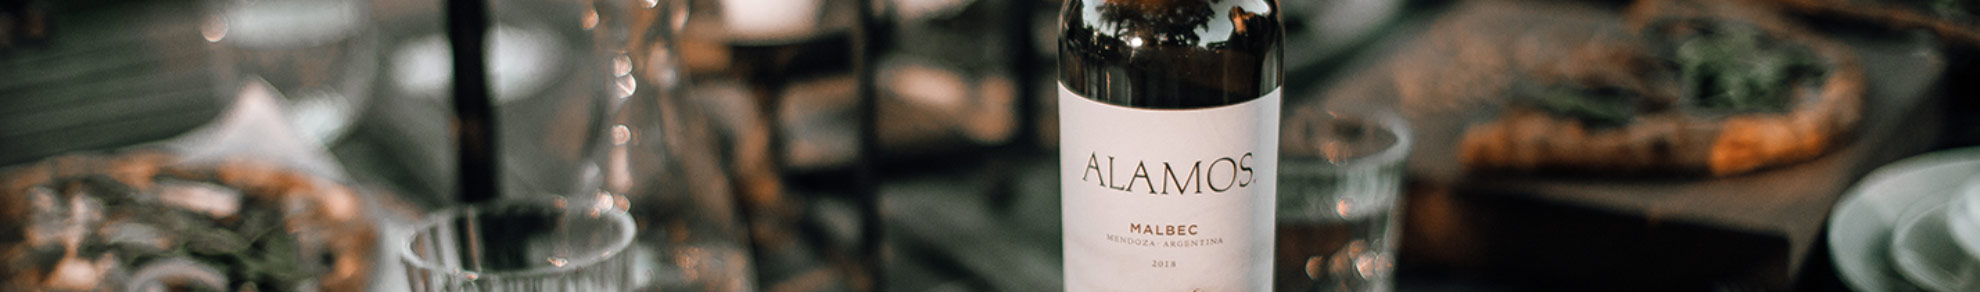 Alamos Wine